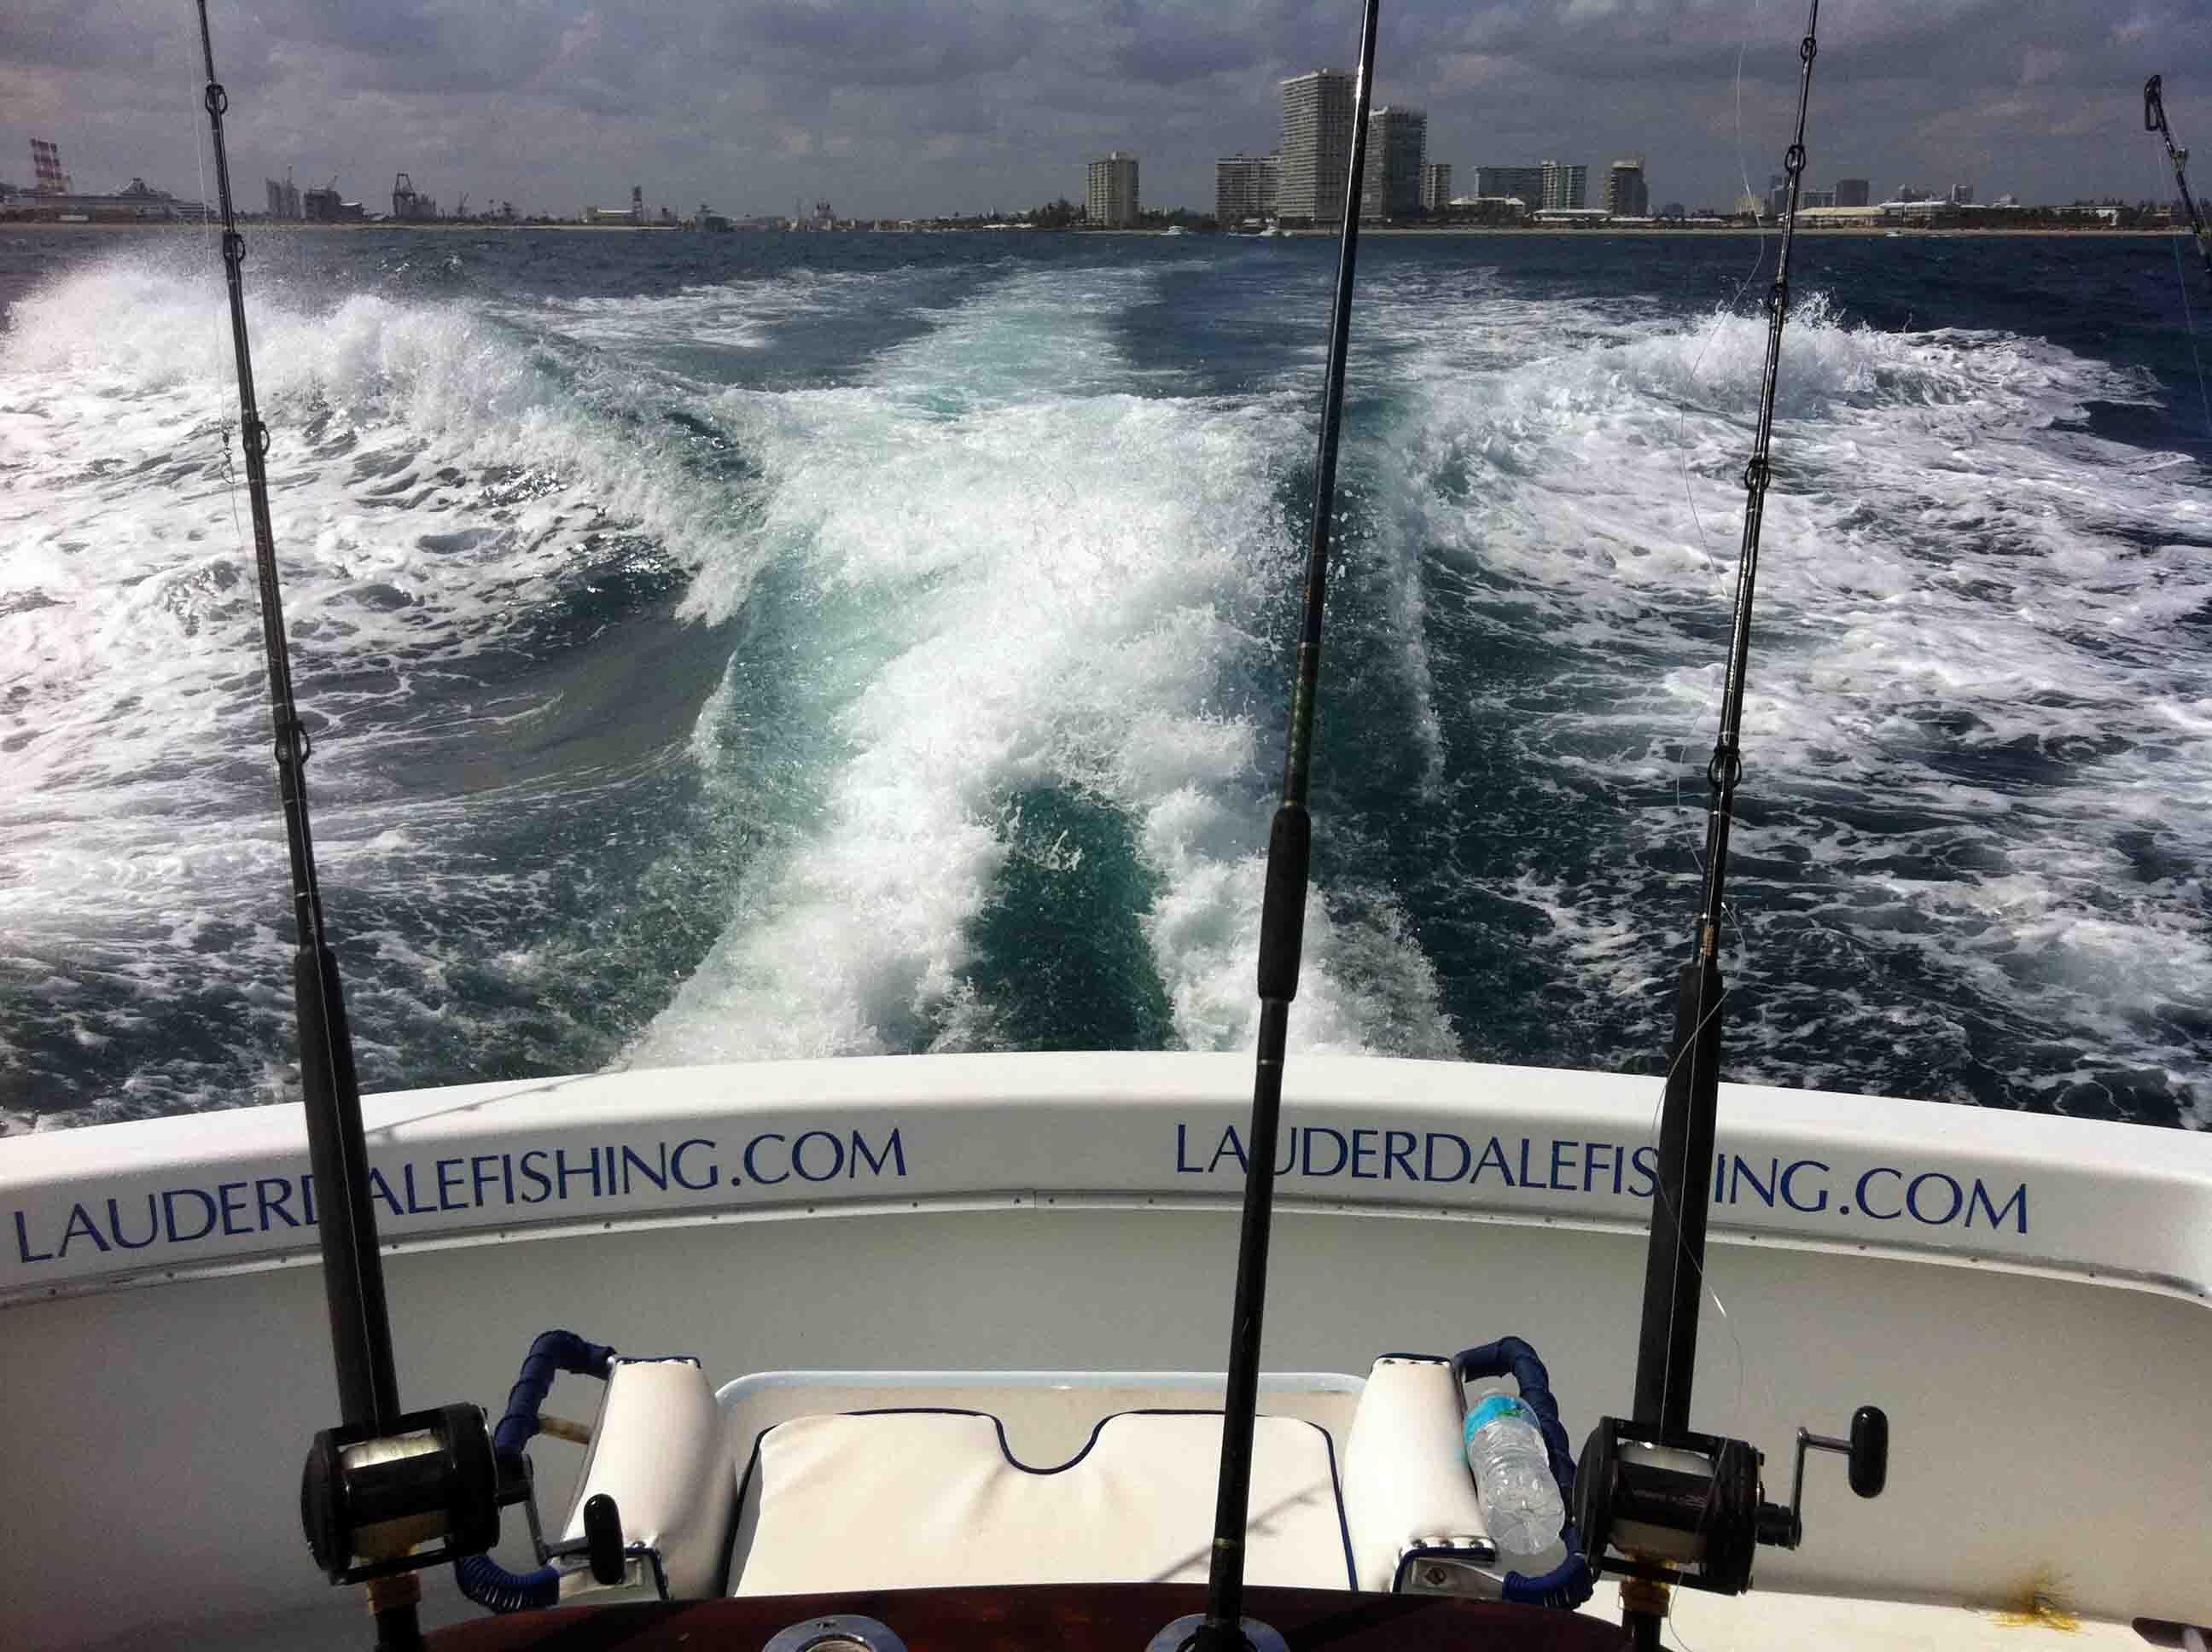 Deep sea fishing in fort lauderdale florida for Deep sea fishing trips near me